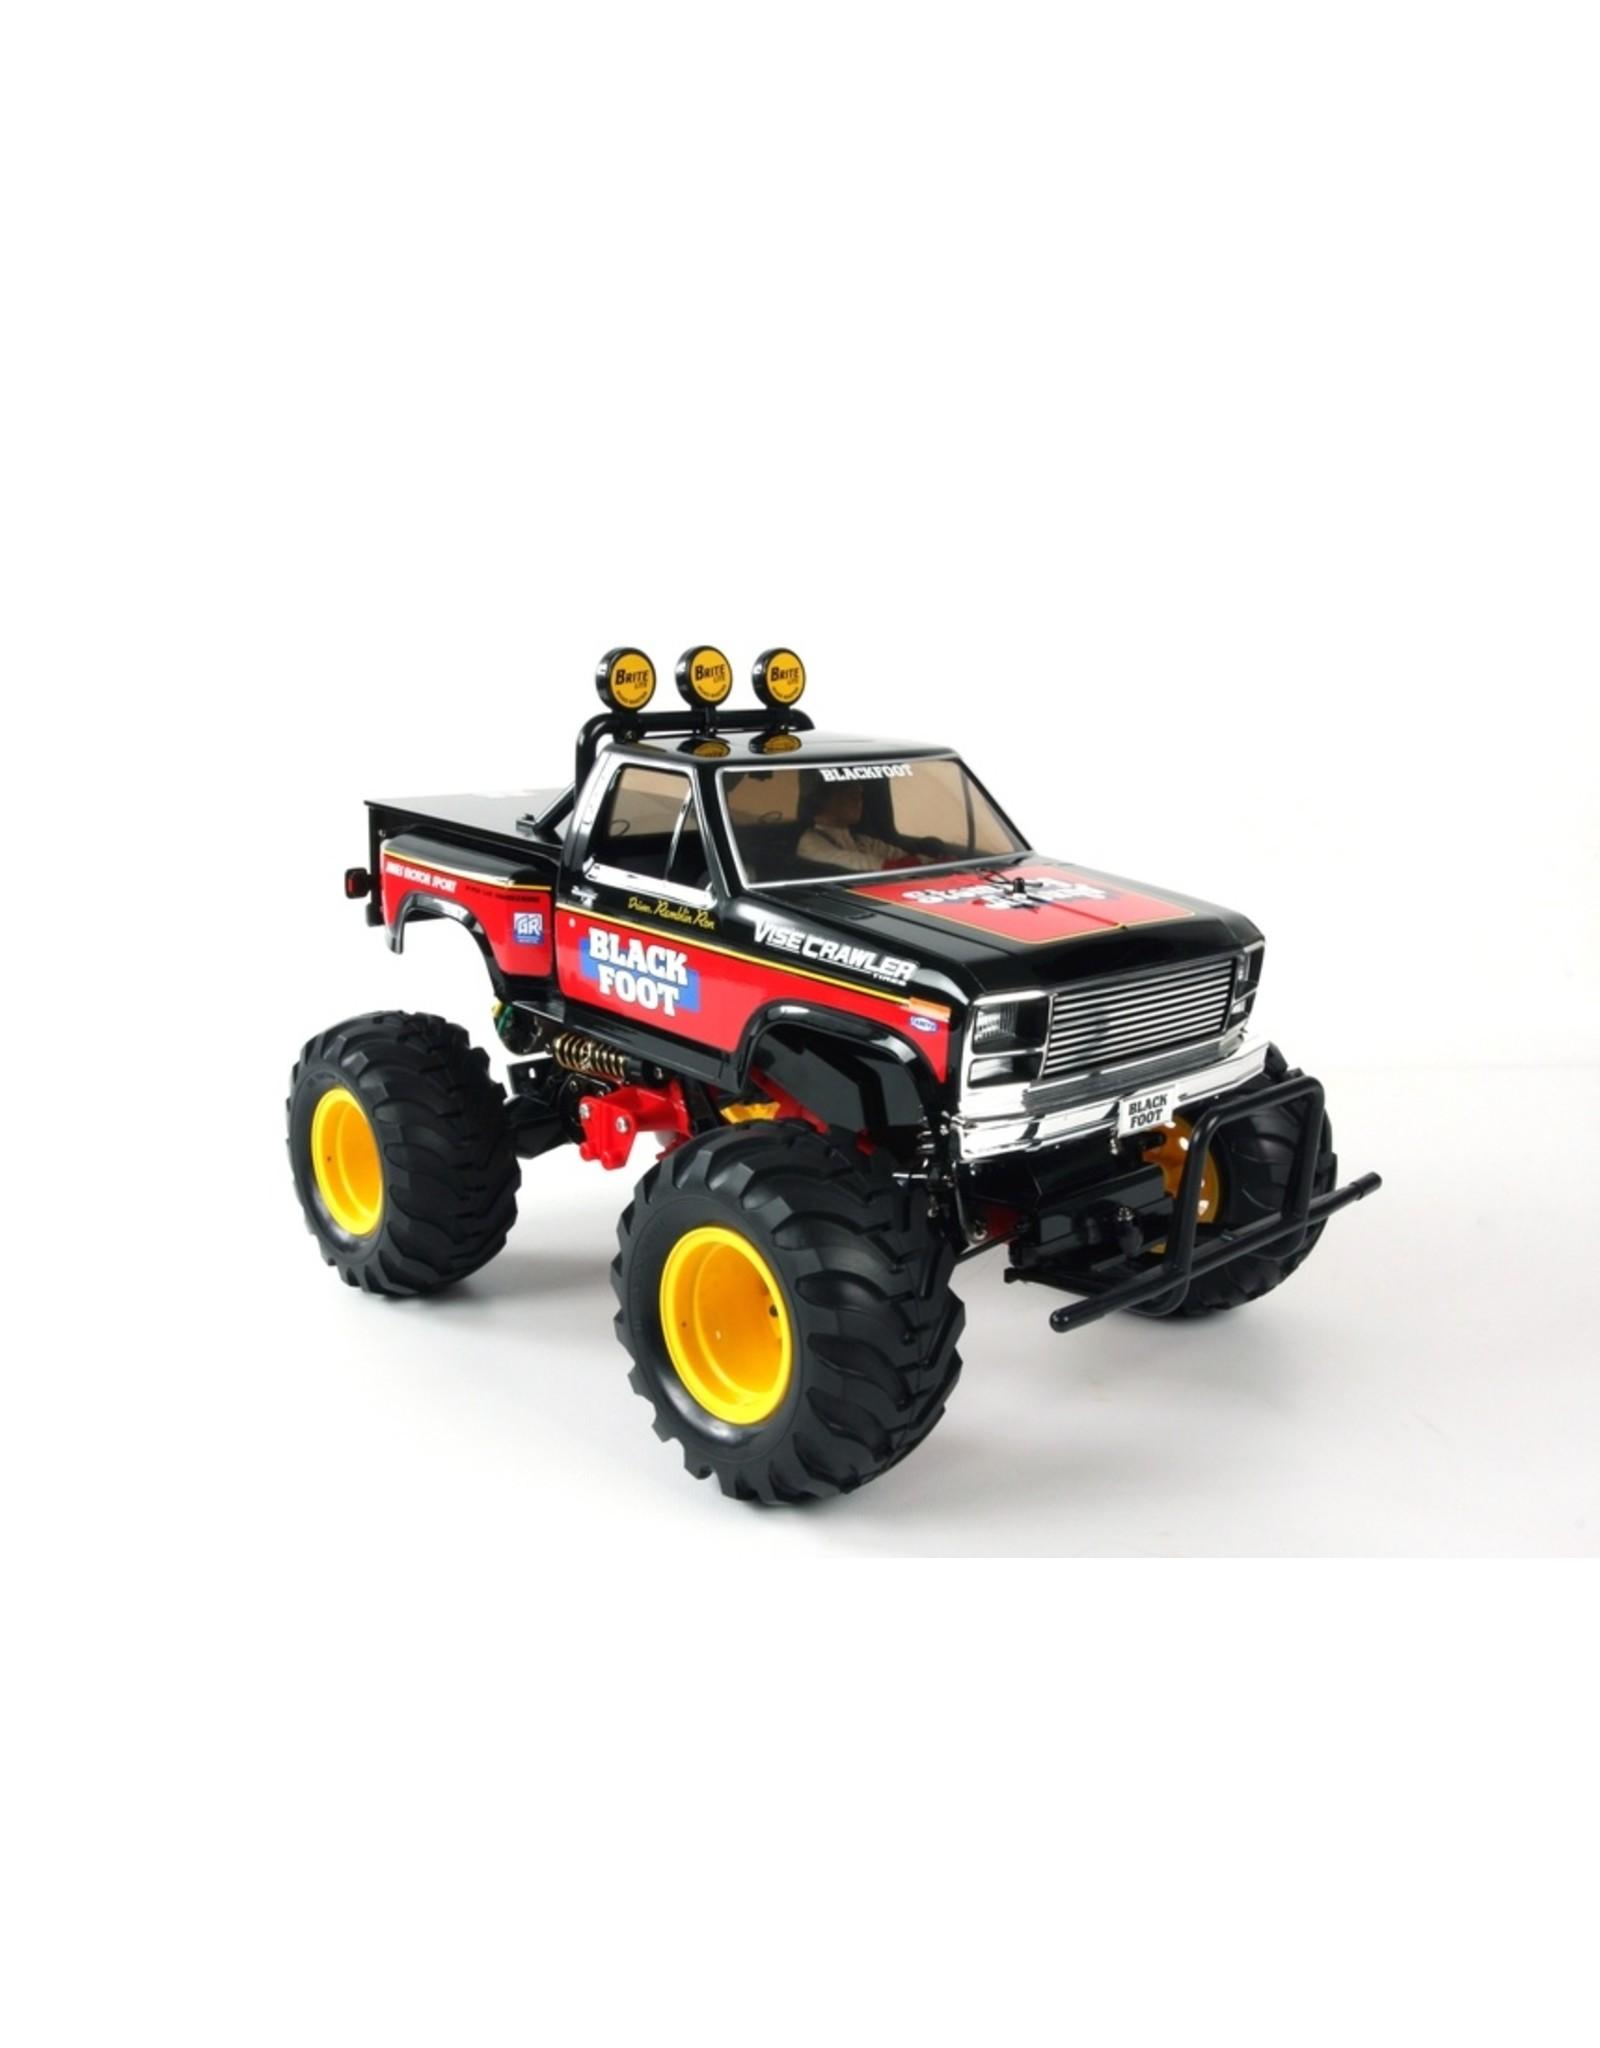 Tamiya 1/10 Blackfoot 2WD 2016 Kit